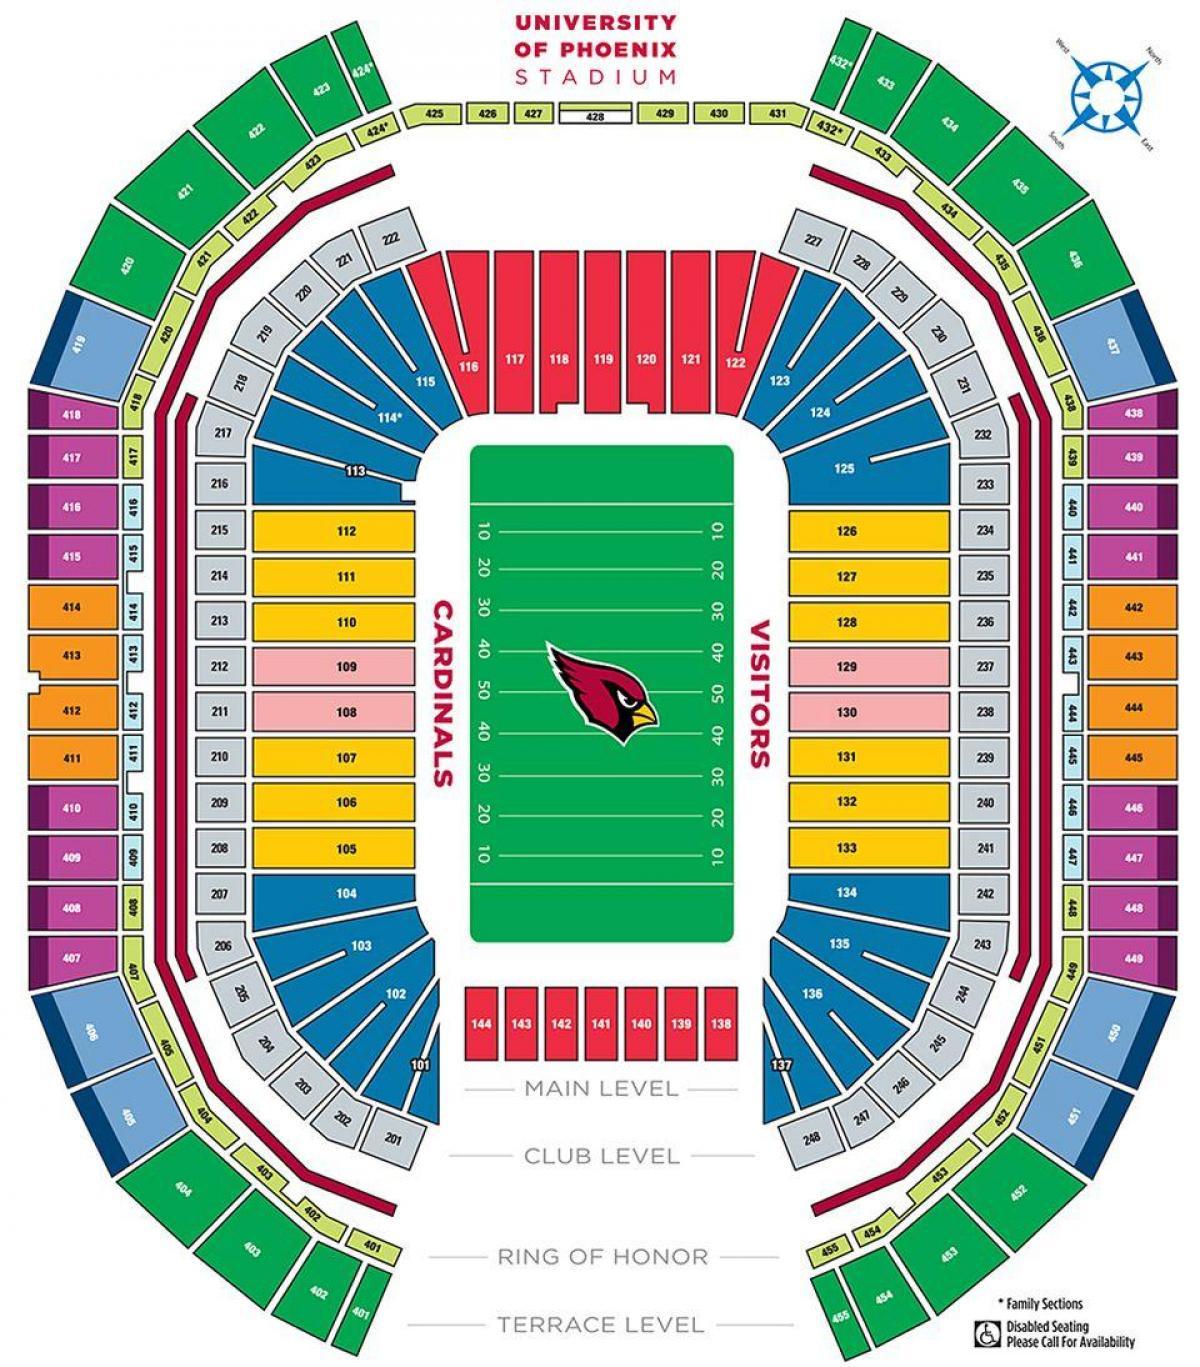 ben hill griffin stadium map ben hill griffin stadium (florida  - notre dame stadium map la zoo map